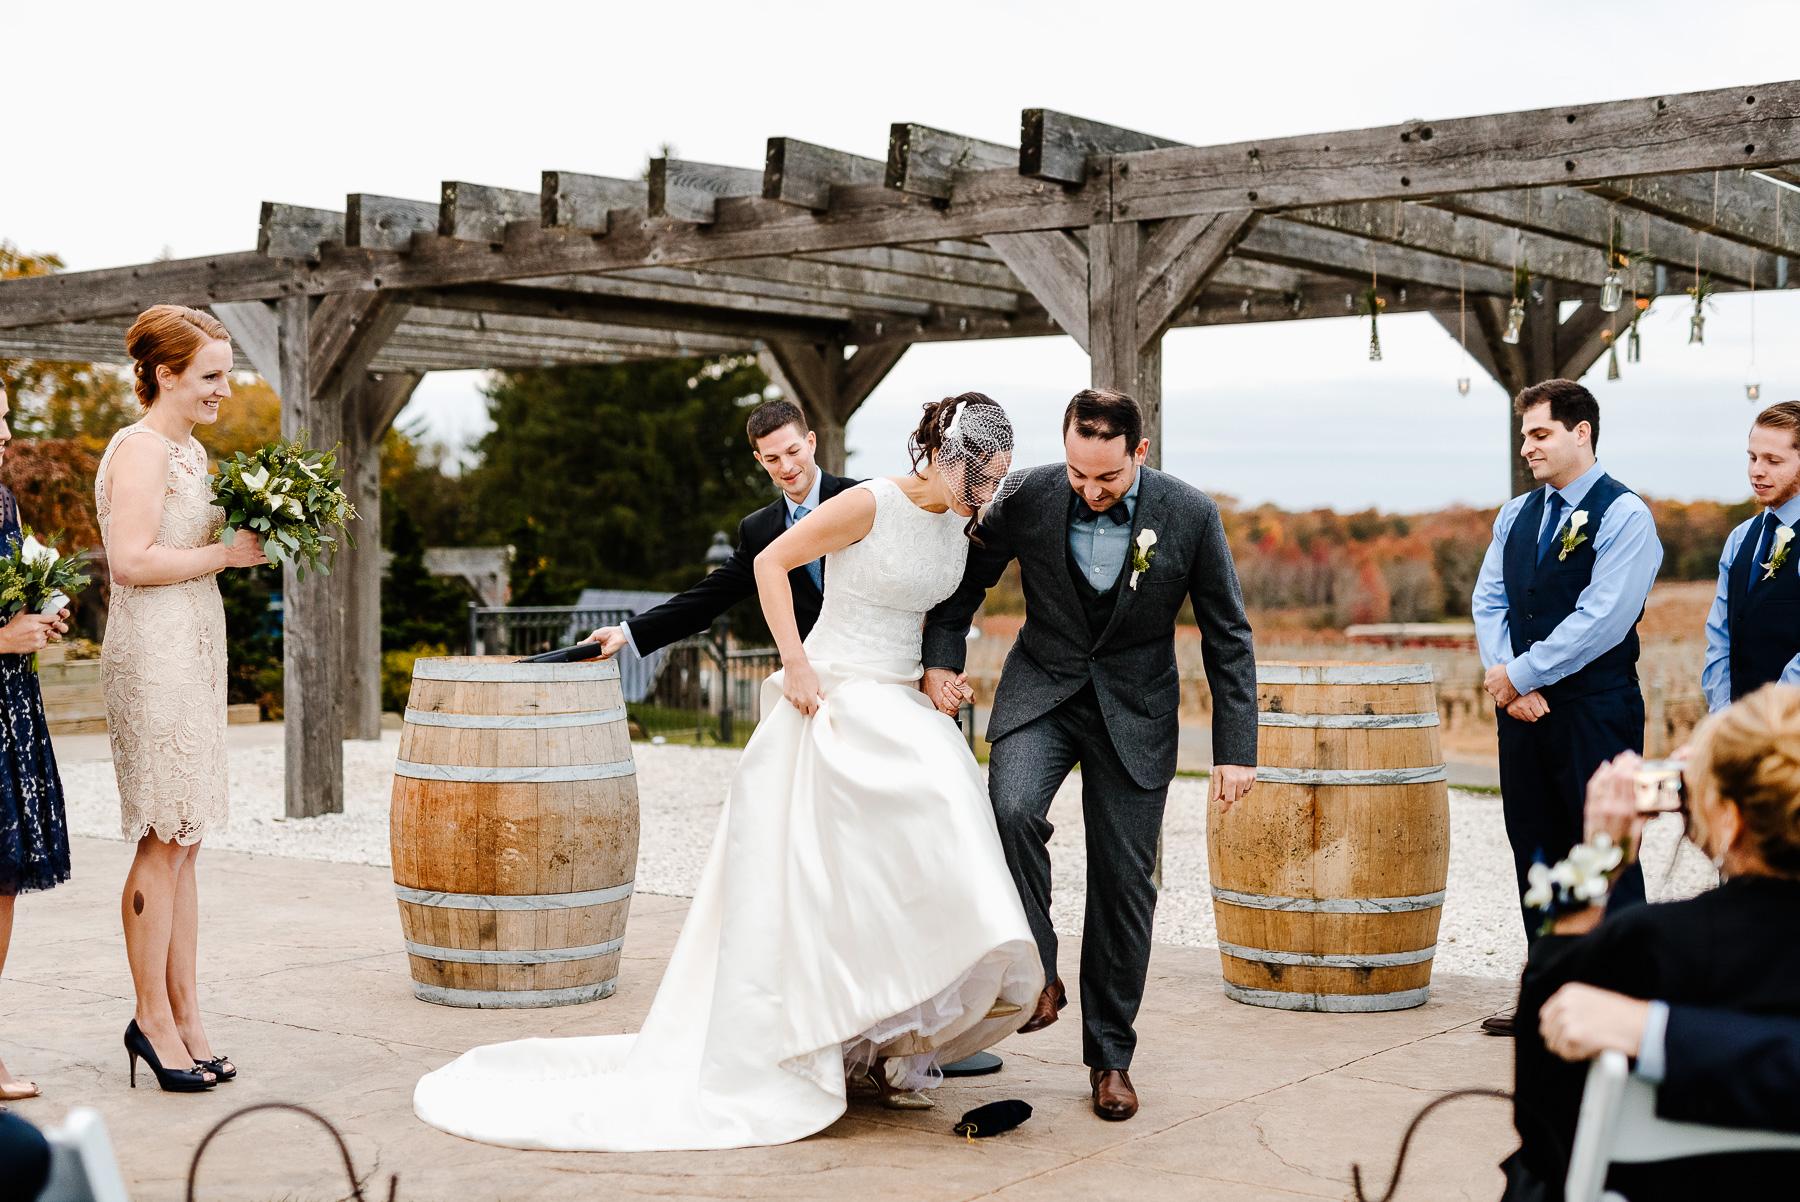 88-Laurita Winery Wedding New Jersey Wedding Photographer Laurita Winery Weddings Longbrook Photography.jpg